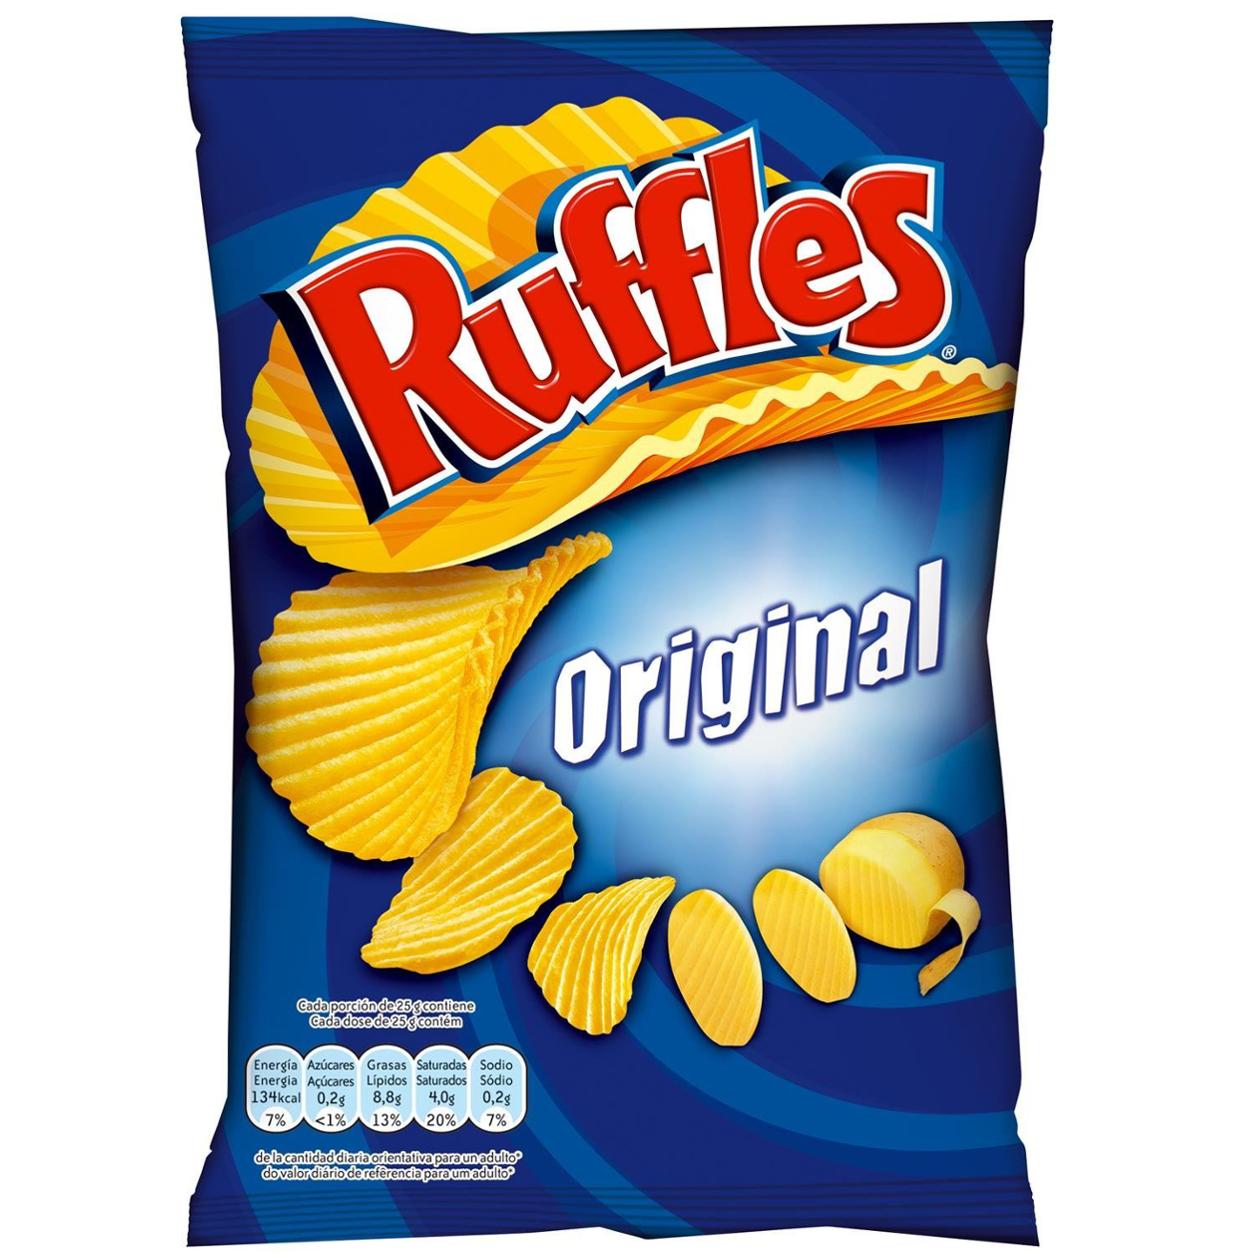 Ruffles Ready Salted Crisps £1 at Heron Foods Hull